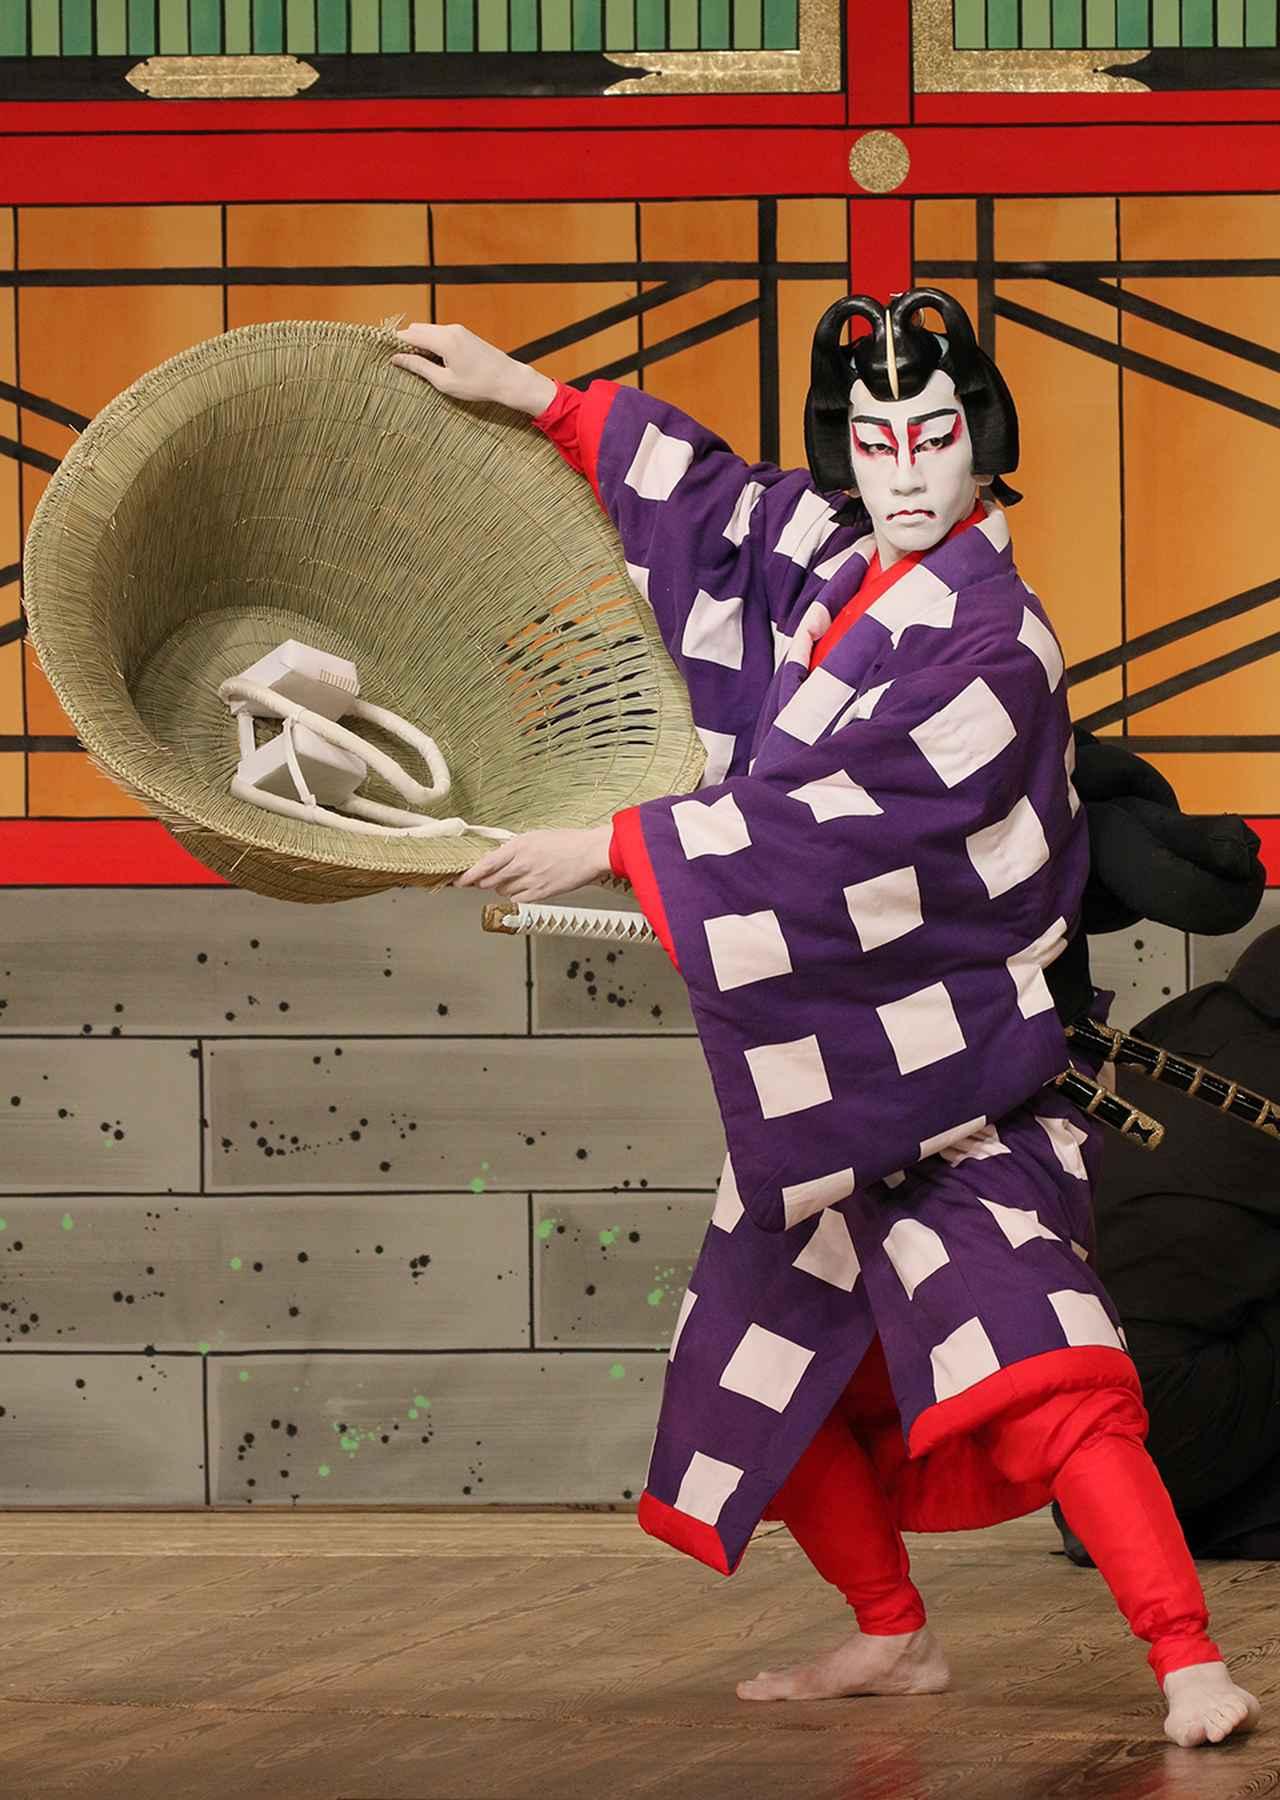 Images : 『菅原伝授手習鑑―車引―』 舎人桜丸=坂東新悟